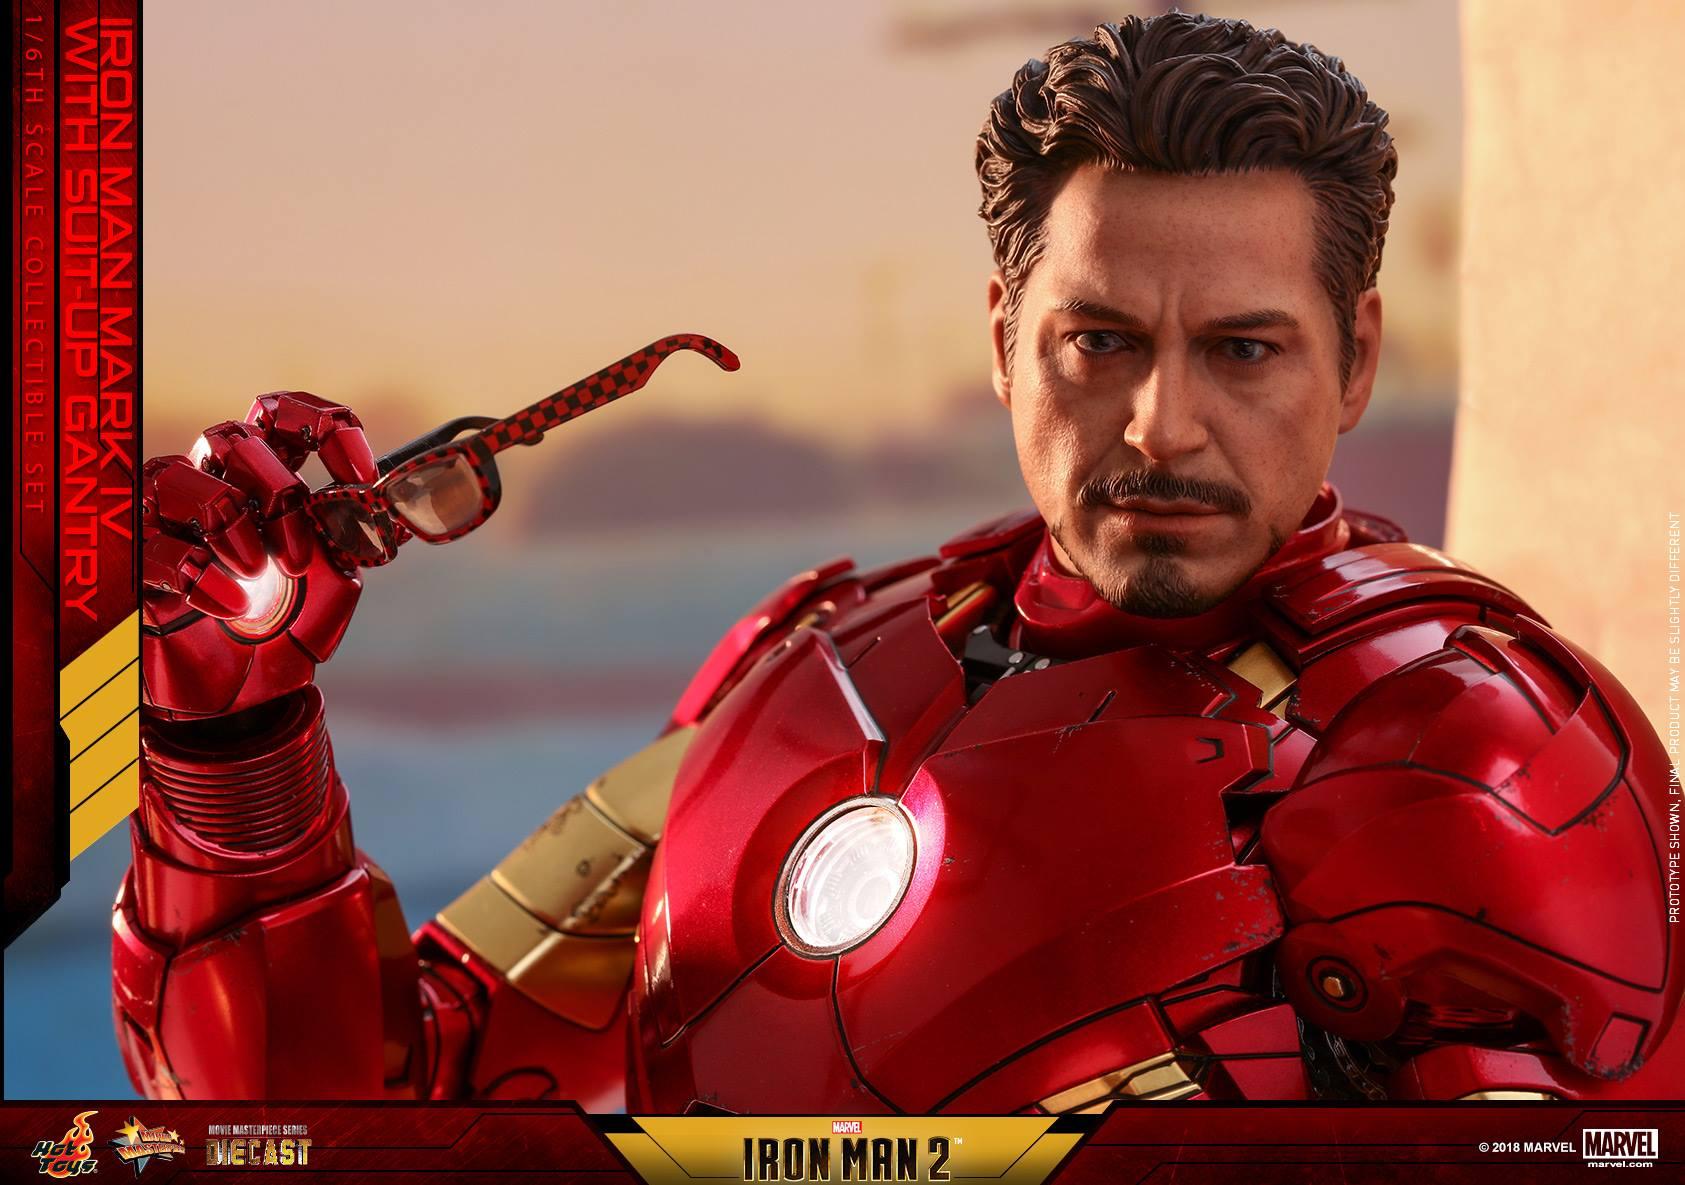 Hot-Toys-Iron-Man-MKIV-with-Gantry-013